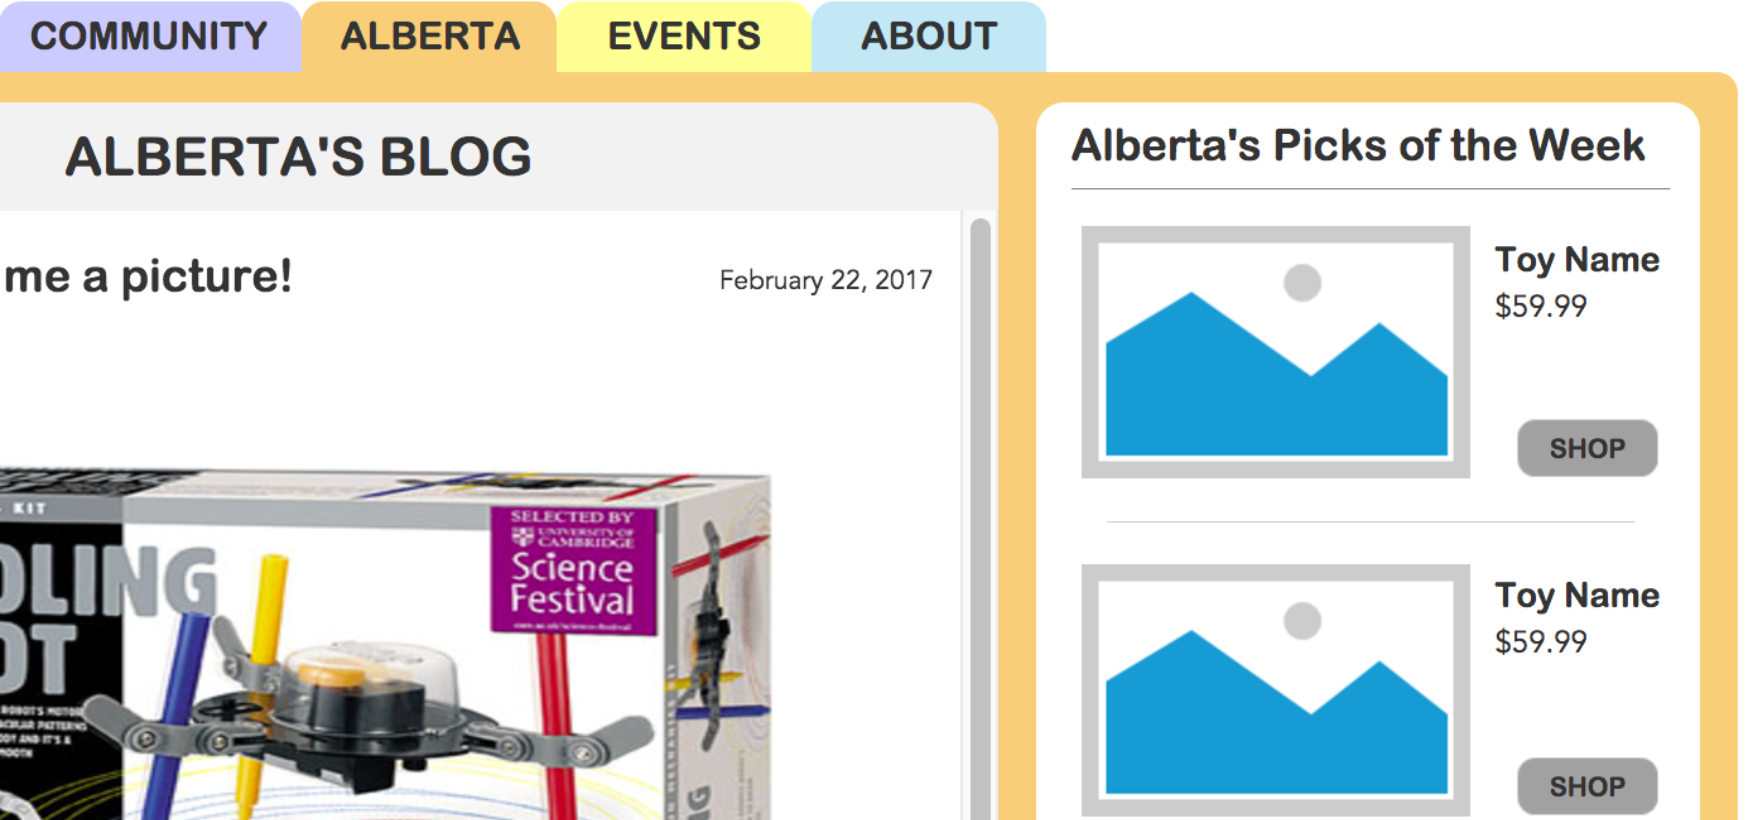 Alberta's Blog2019-6-19 allPageImages - Google Drive.png